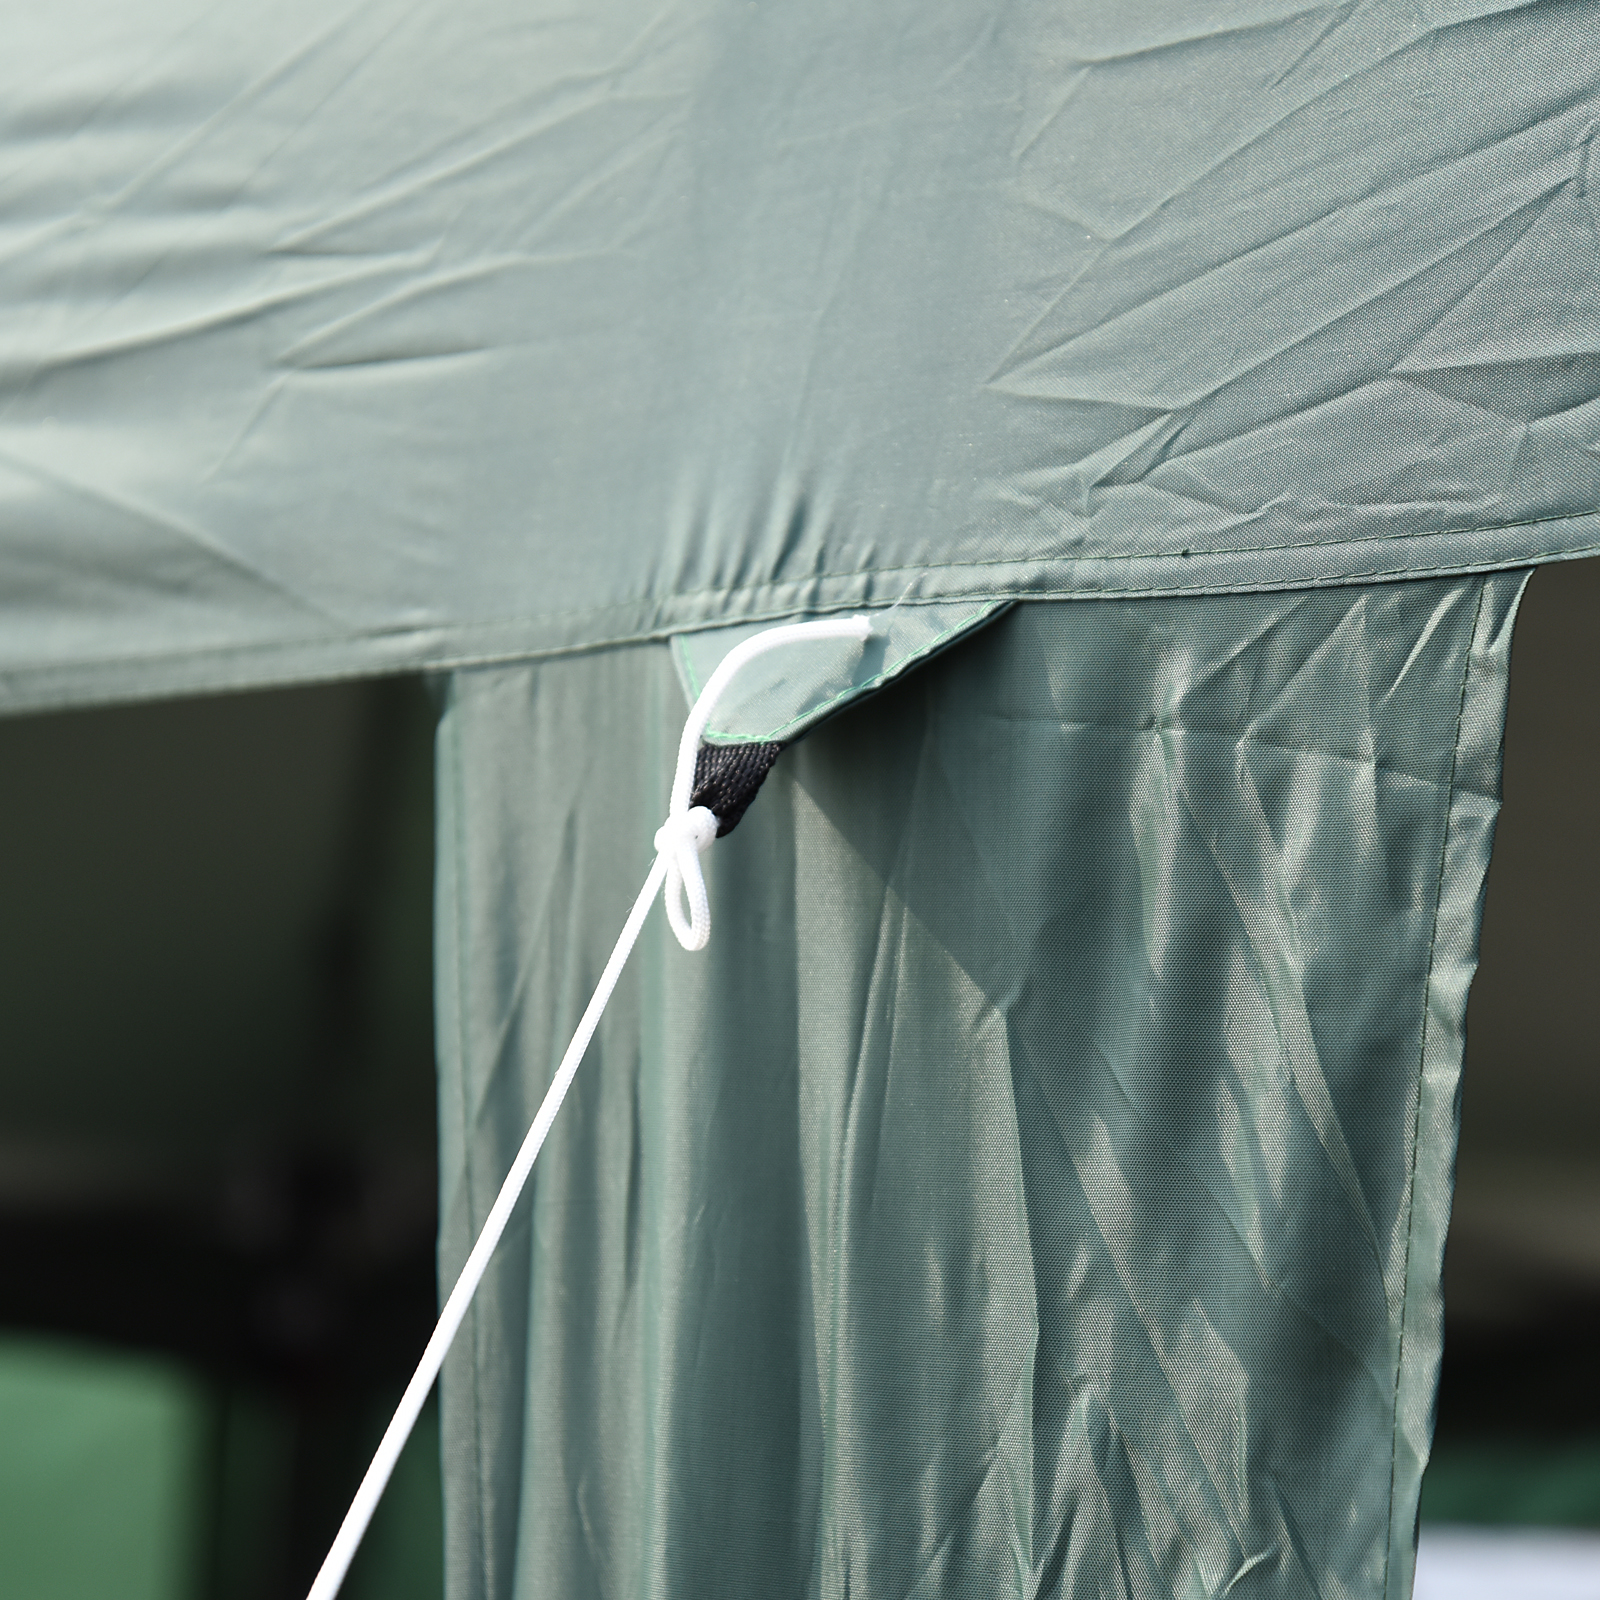 Outdoor-10-039-x20-039-EZ-POP-UP-Gazebo-Wedding-Party-Tent-Canopy-Folding-w-Carry-Bag thumbnail 32